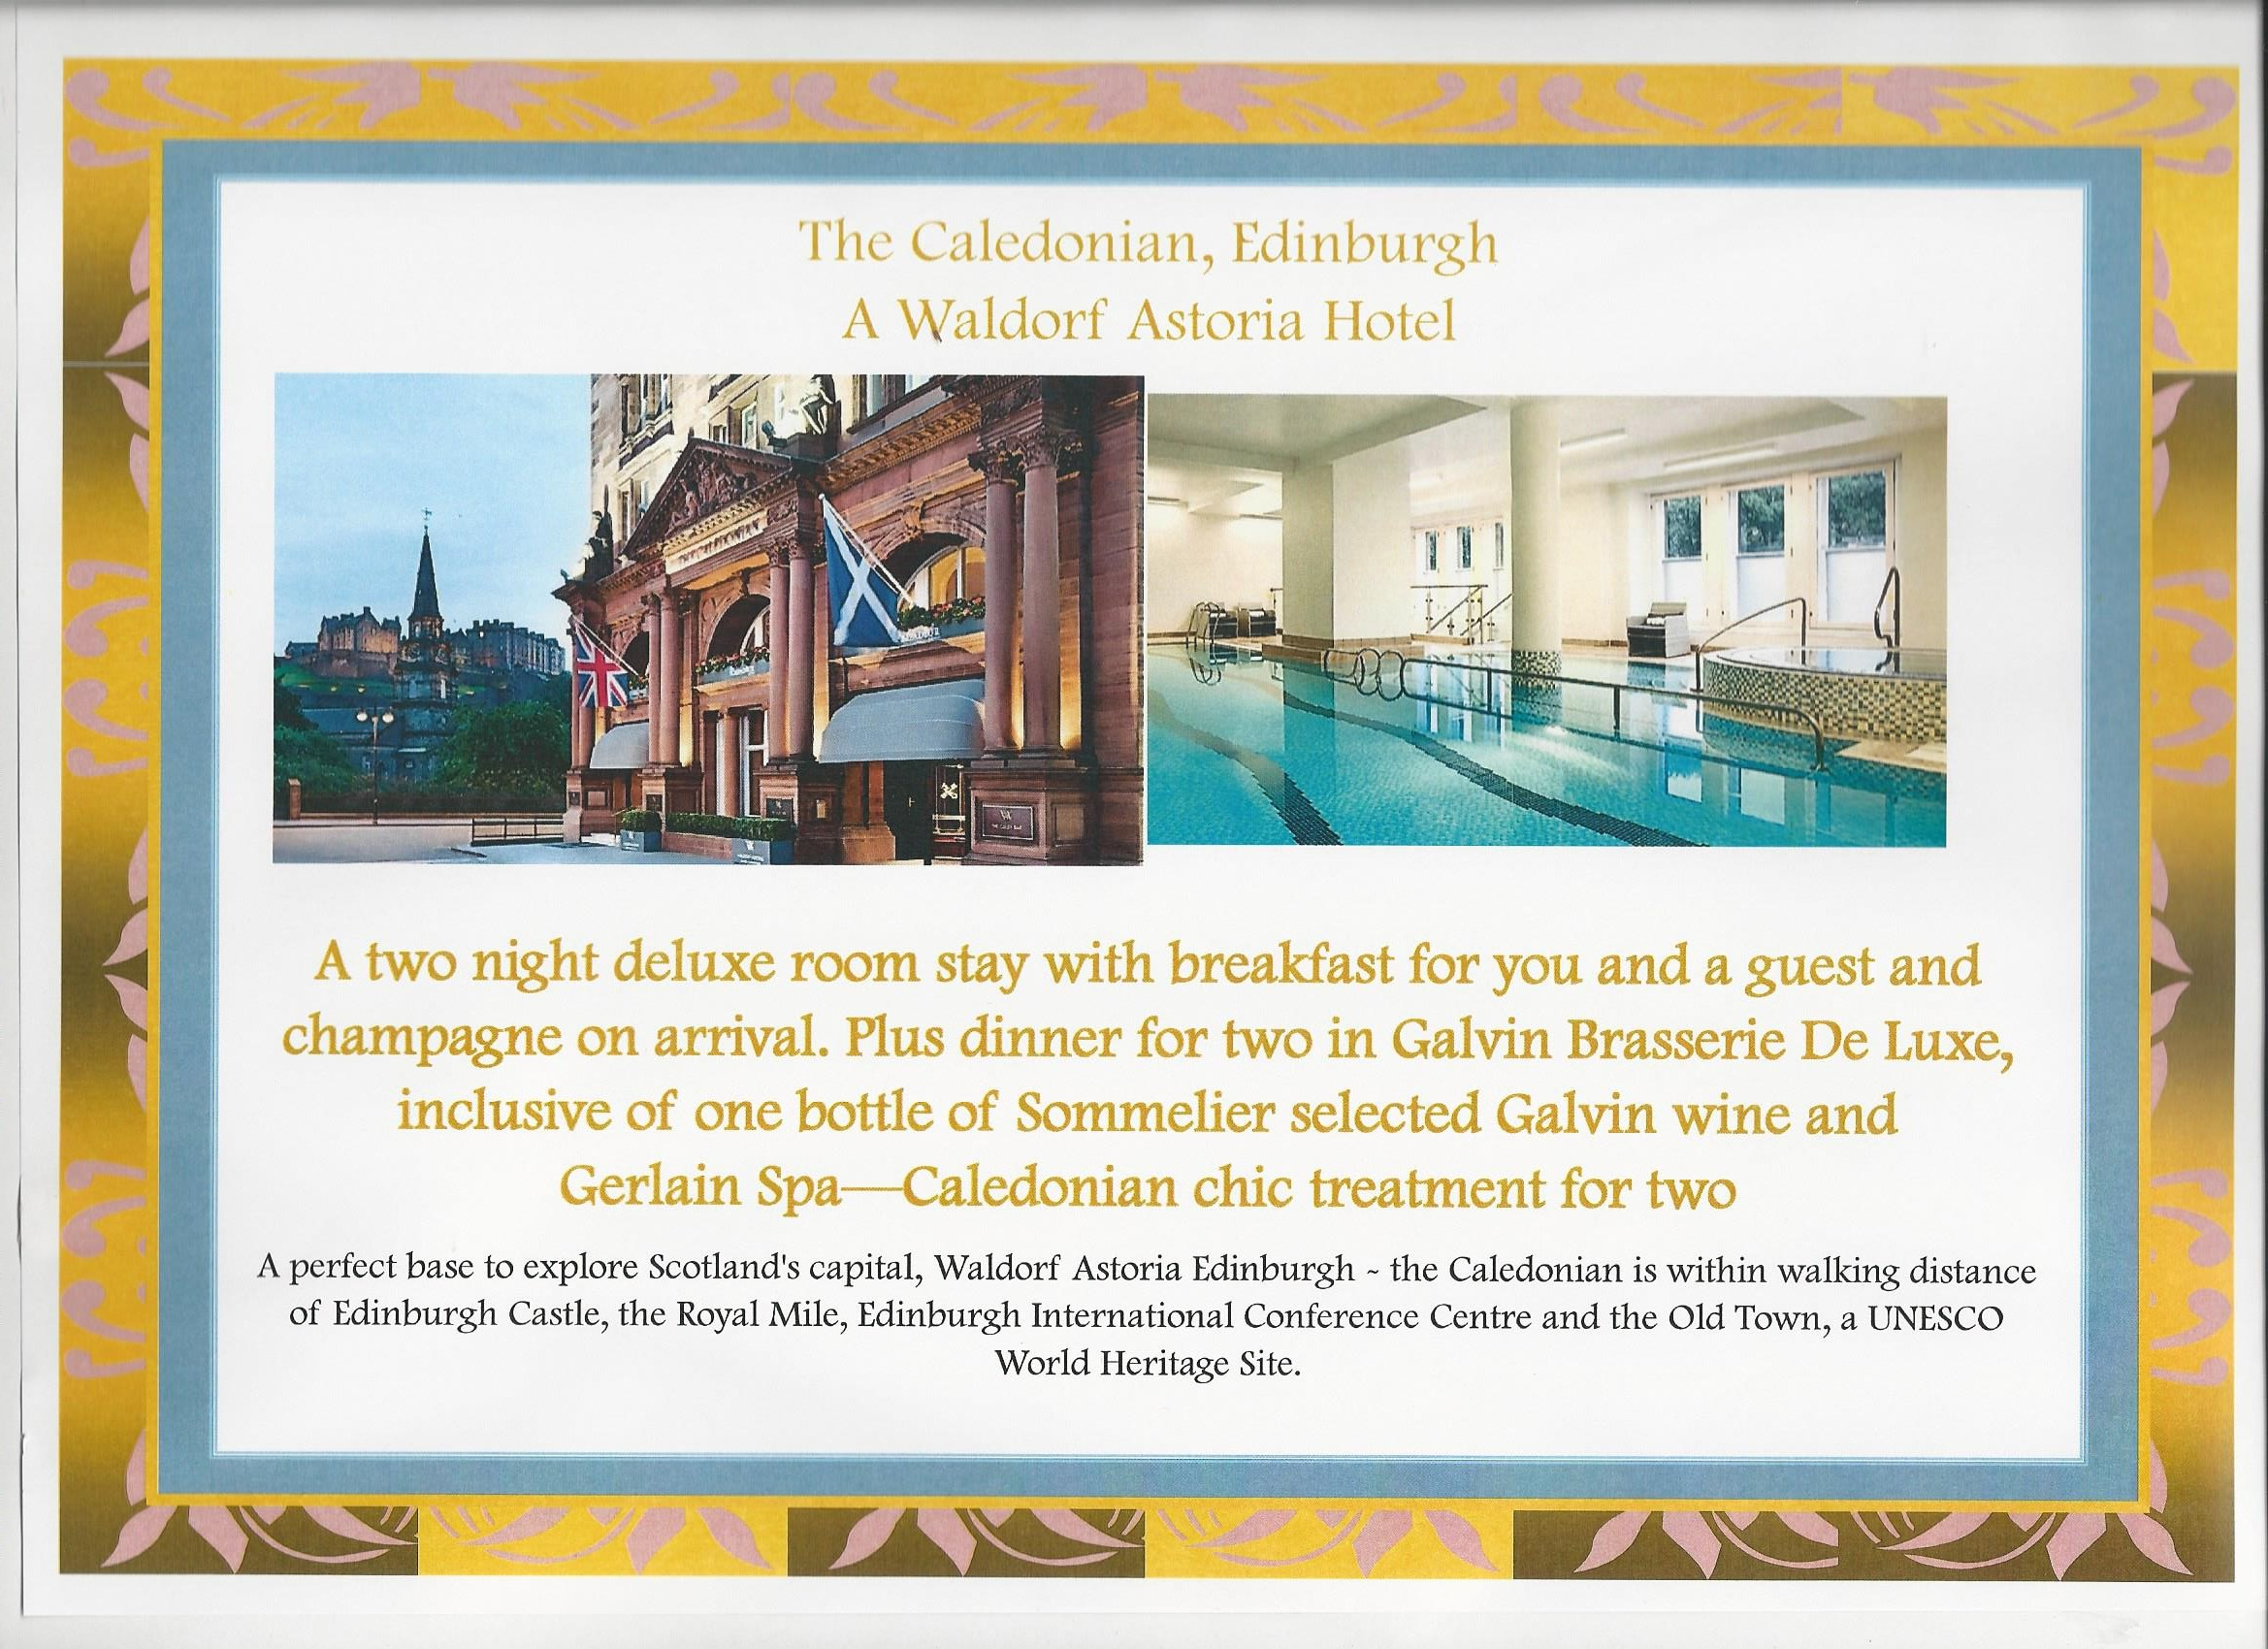 The Caledonian Edinburgh, a Waldorf Astoria hotel